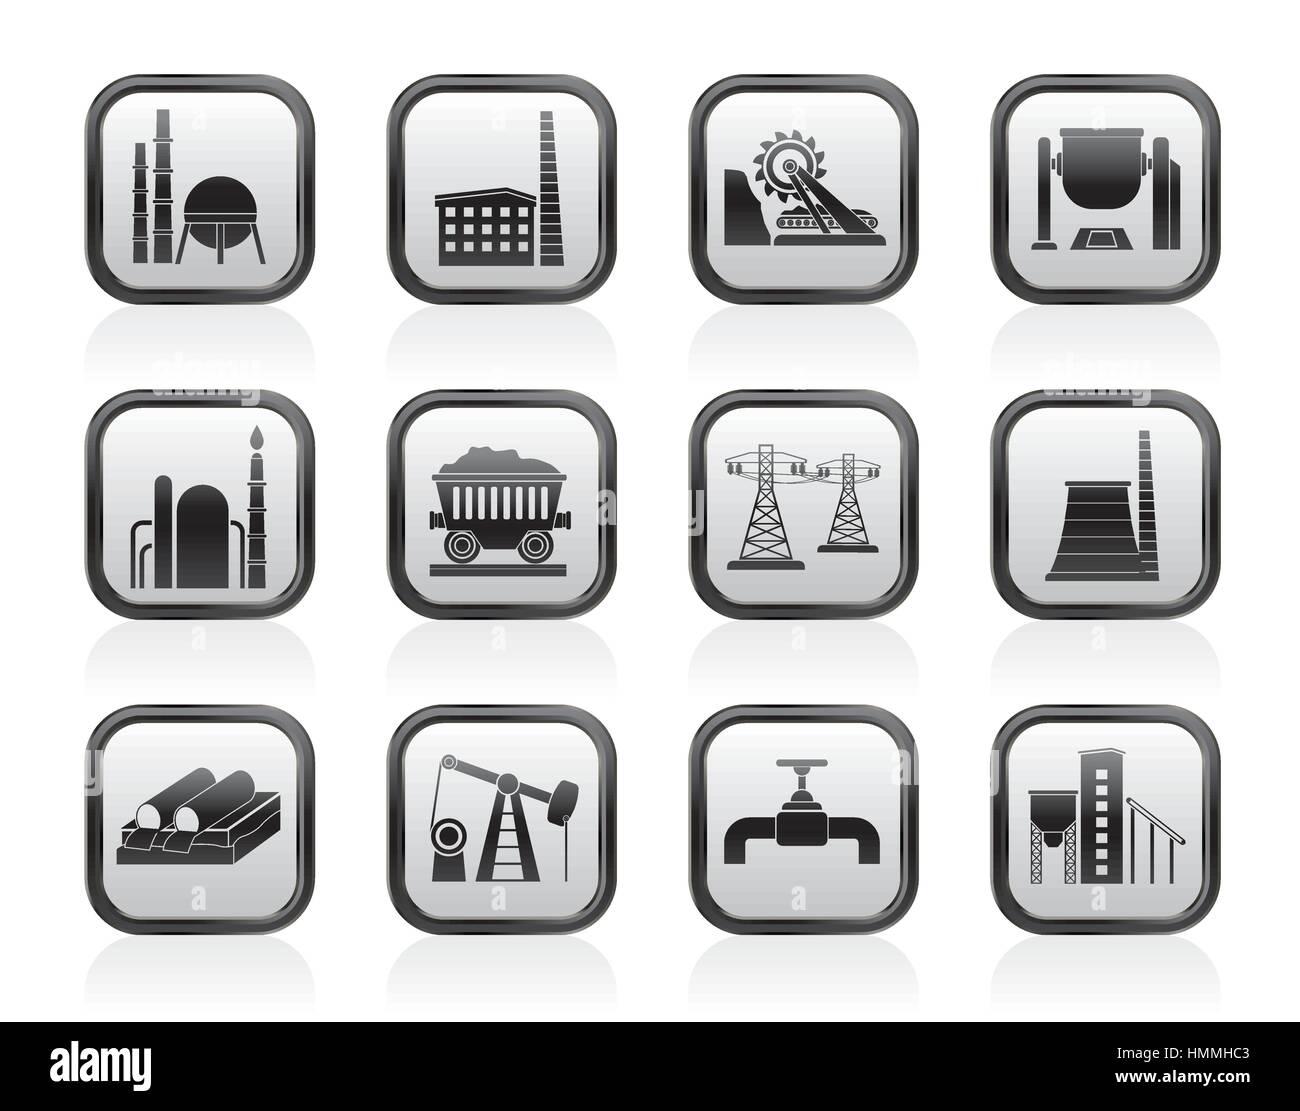 Heavy industry icons - Stock Vector